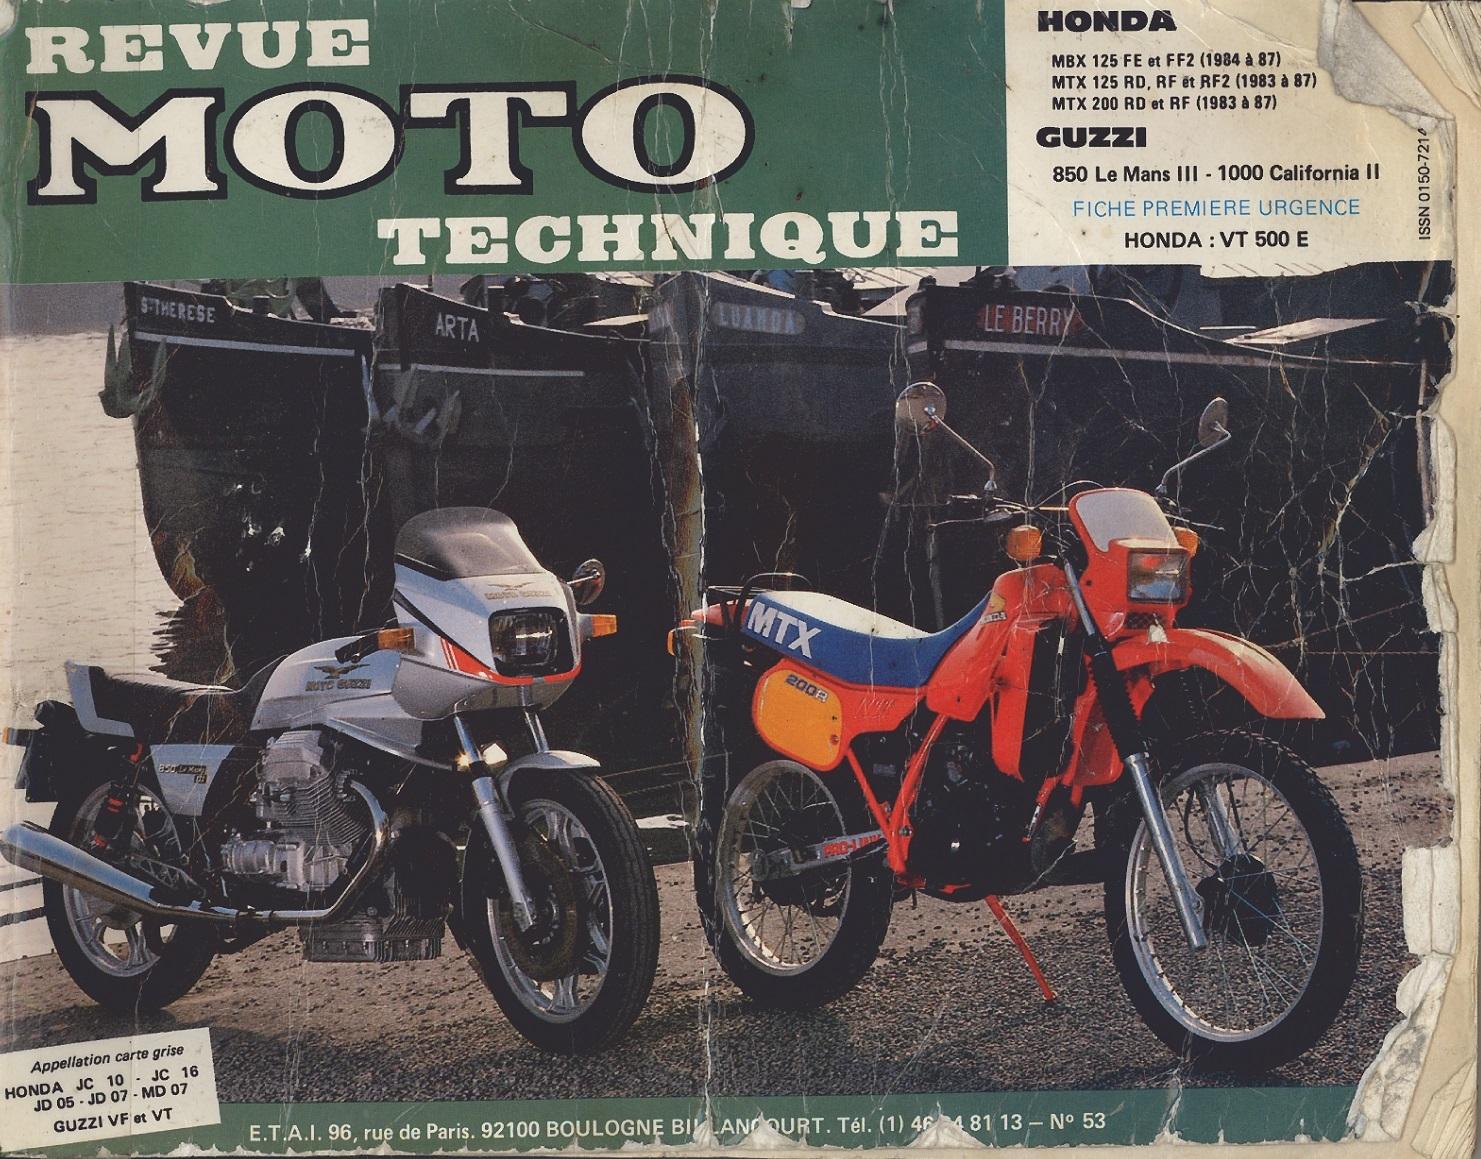 Workshop Manual for Honda MBX125FE (1984-1987)